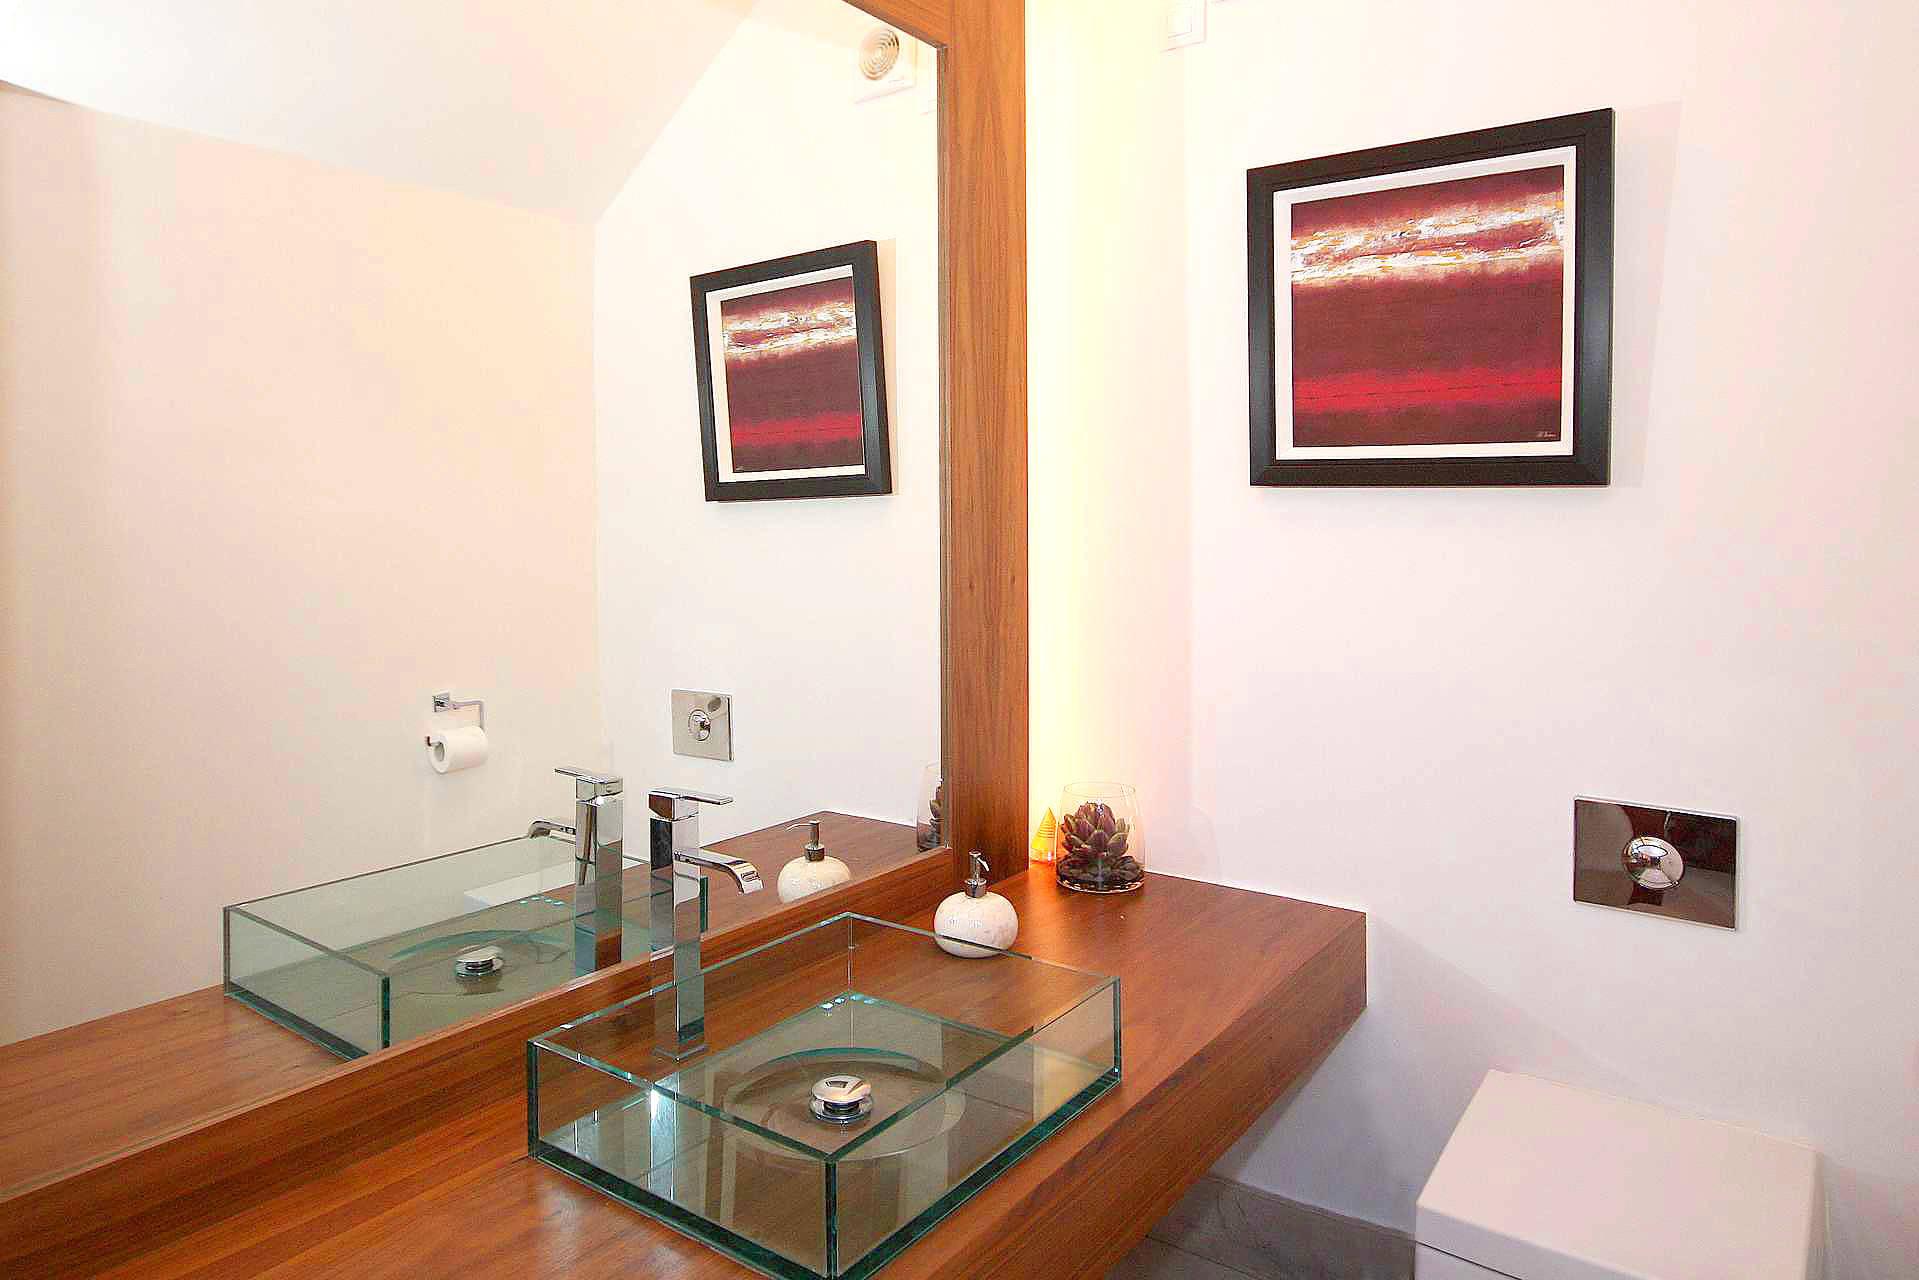 01-92 Design Villa Mallorca Südwesten Bild 18